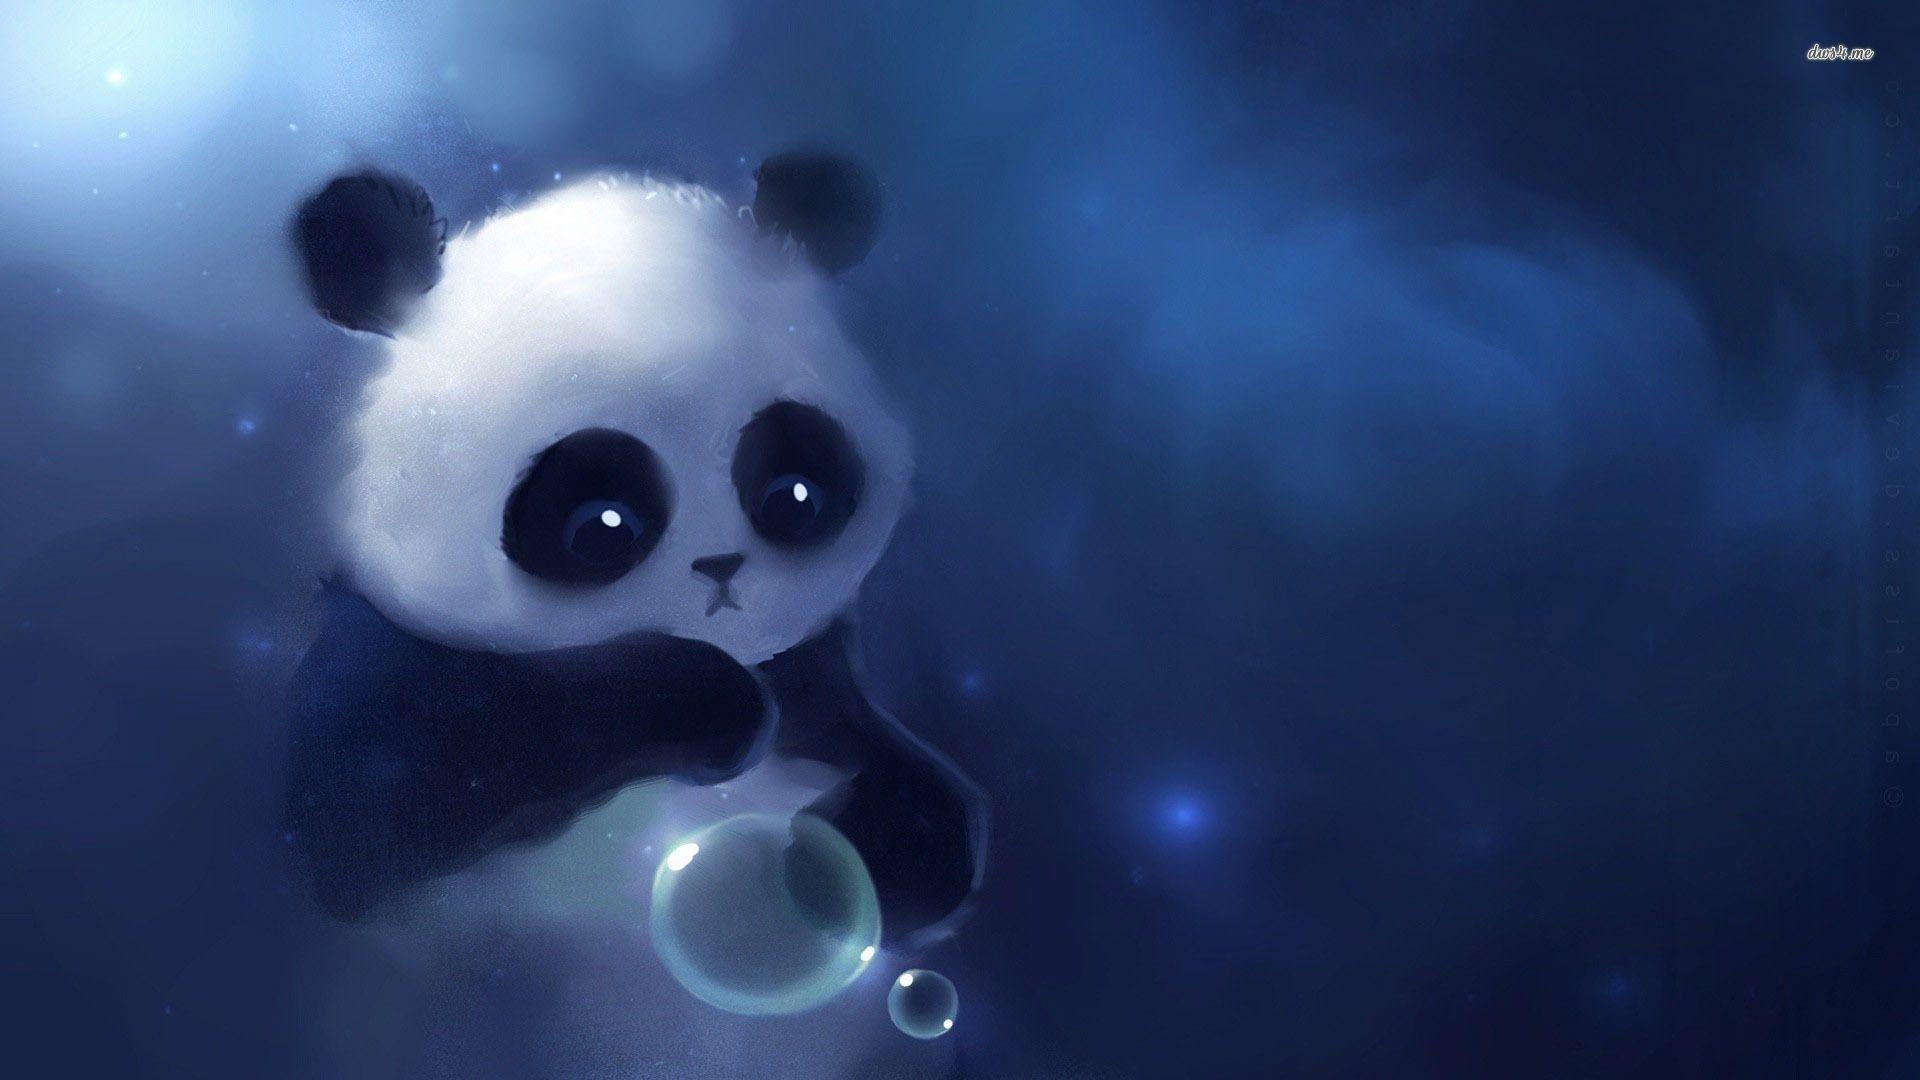 Cute Panda Backgrounds Wallpaper Cave Cute Panda Wallpaper Panda Wallpapers Panda Background